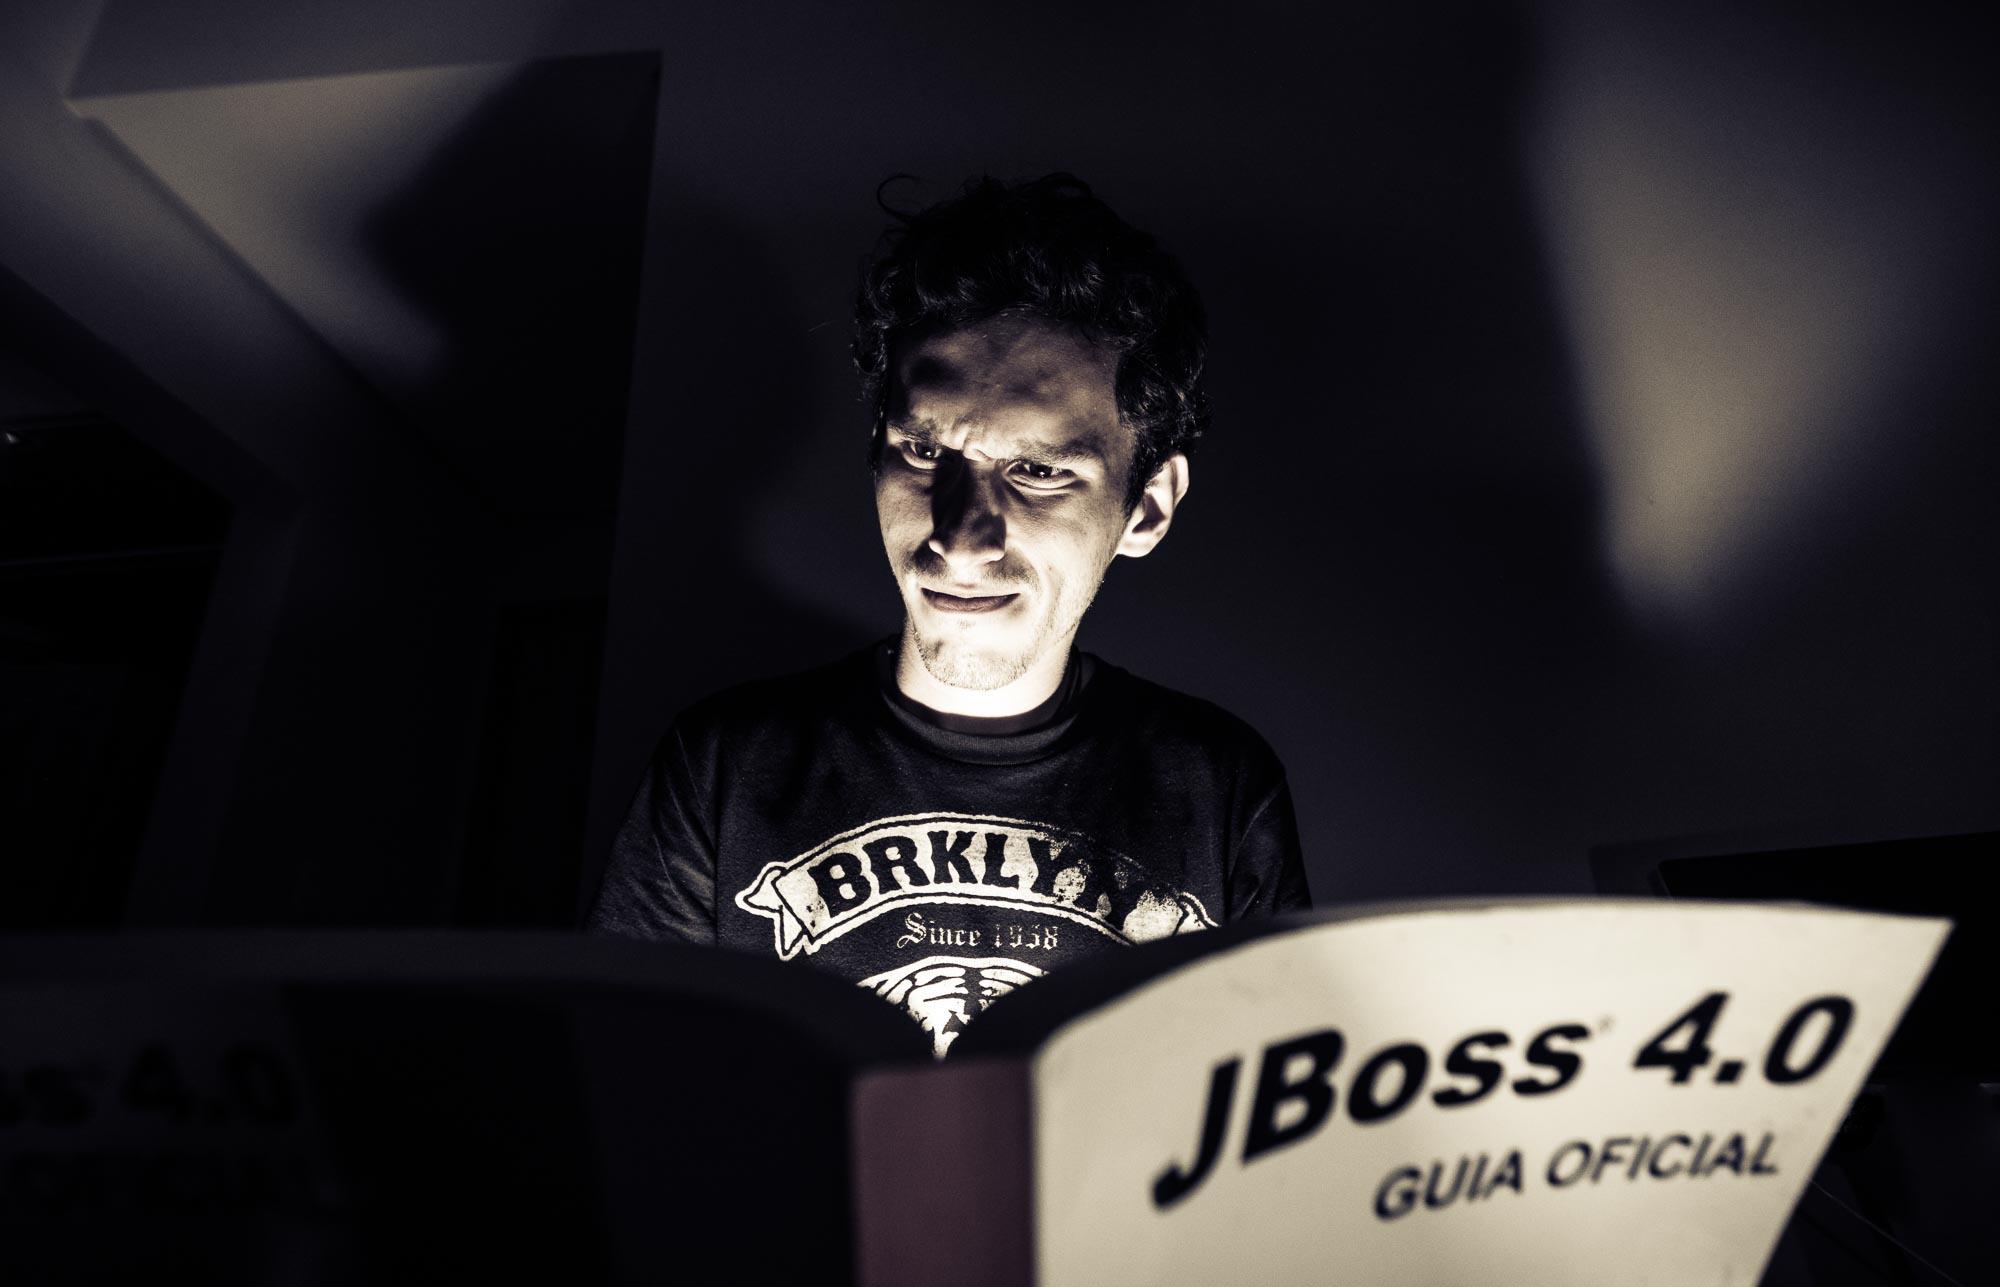 AcidBook JBoss